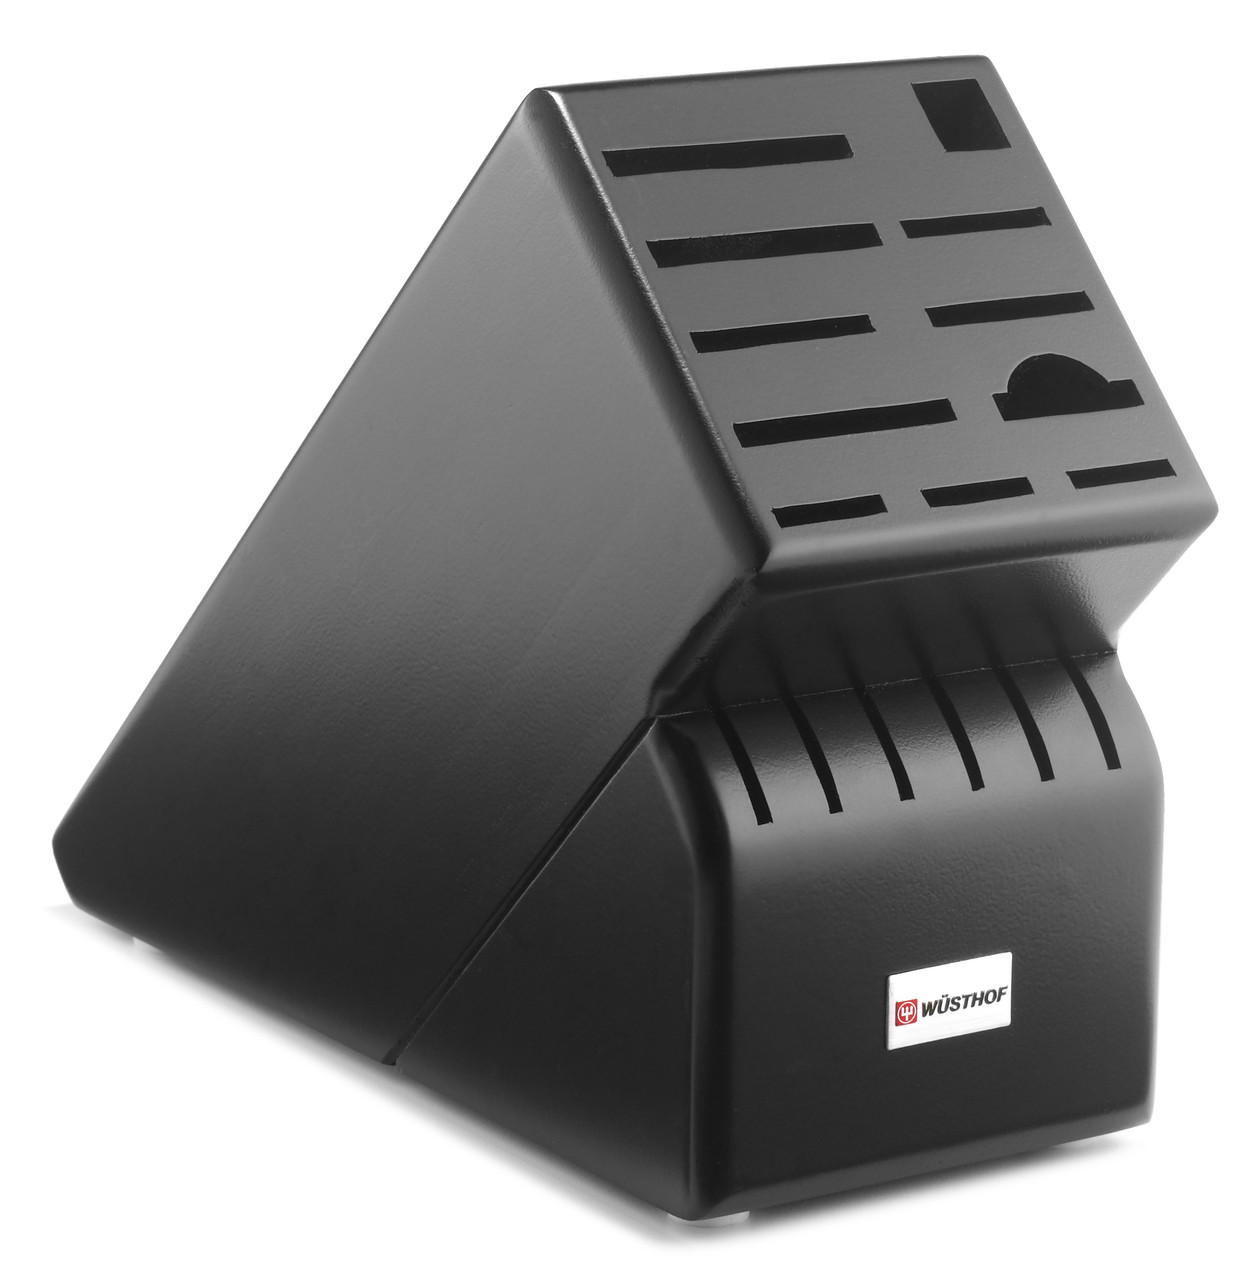 Wusthof Trident 17-Slot Black Block